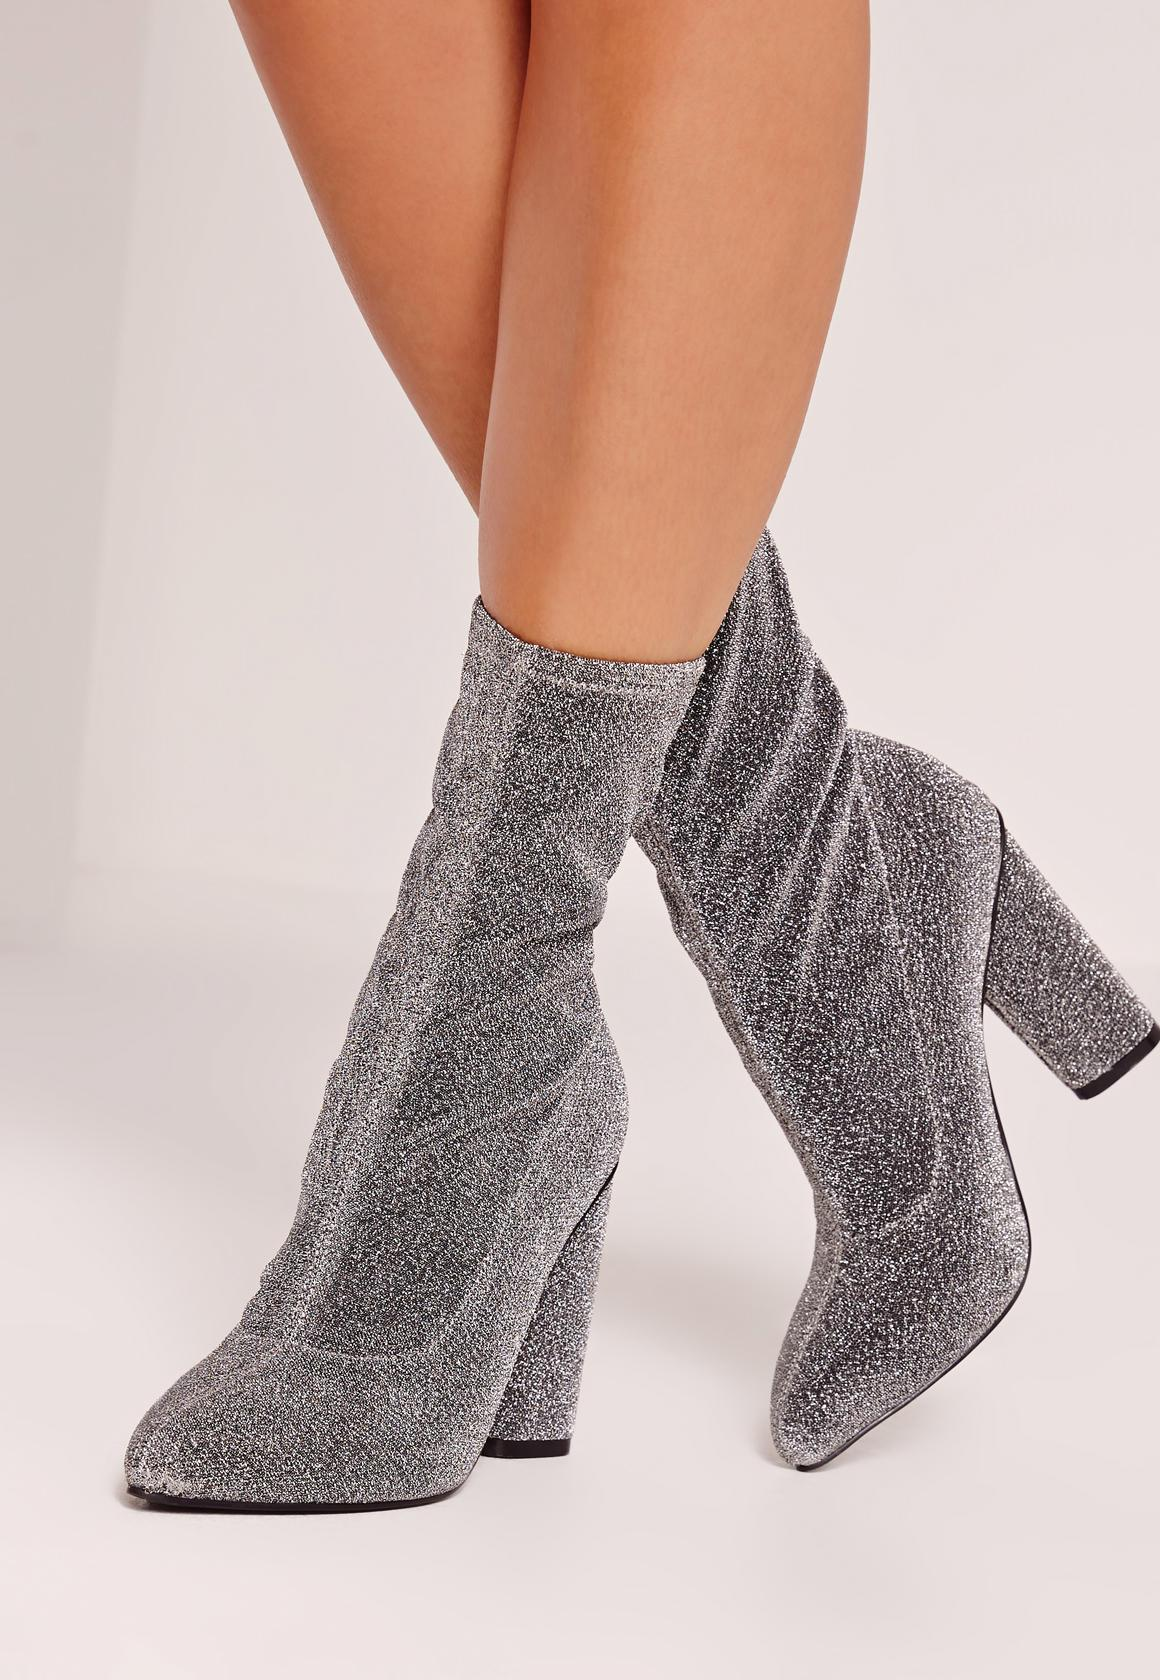 Silver Booties Heels - Red Heels Vip